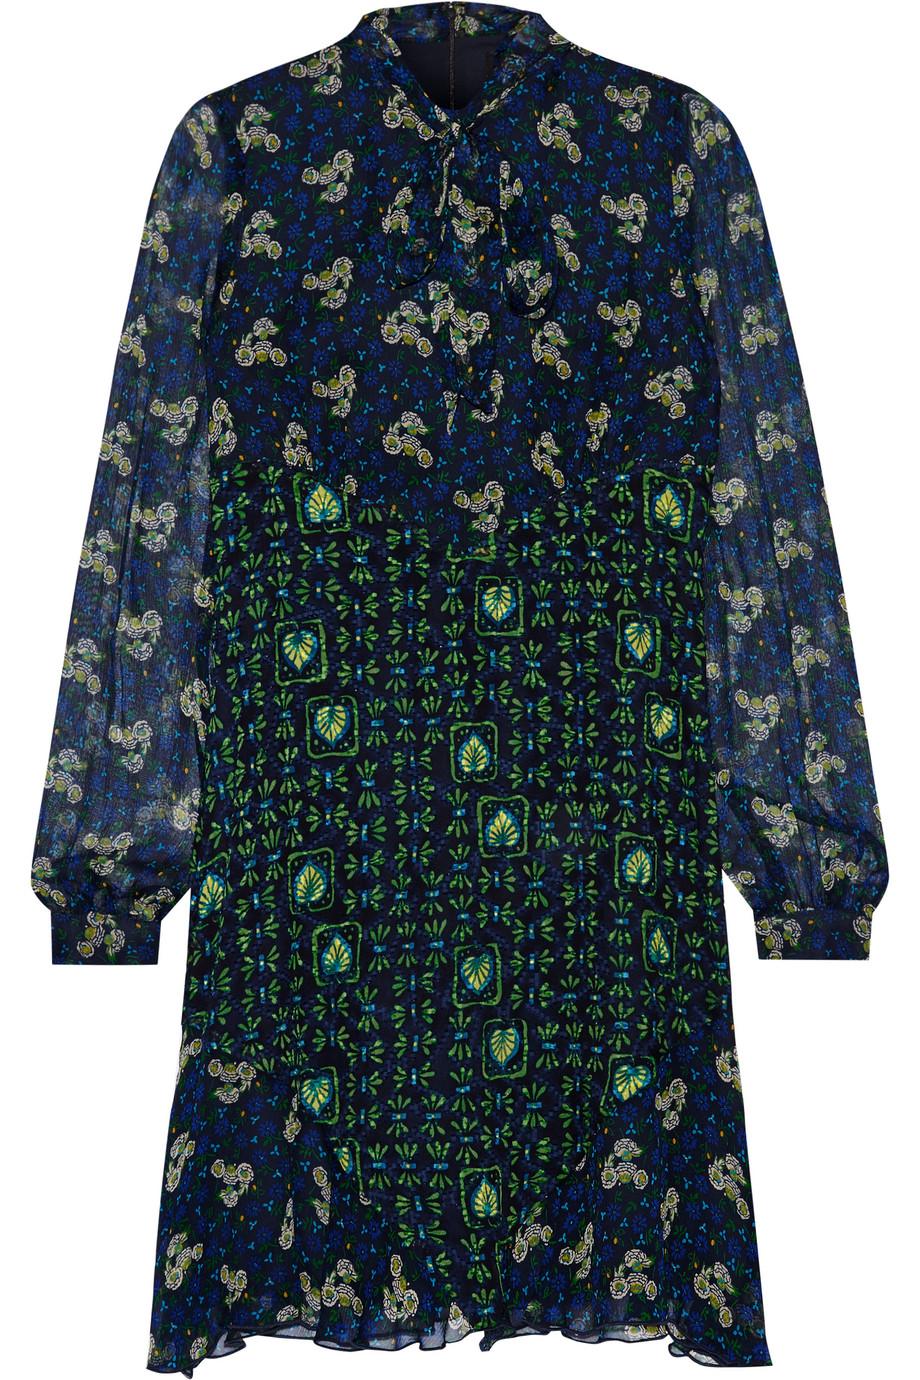 Anna Sui Pussy-Bow Printed Silk-Chiffon Mini Dress, Midnight Blue/Green, Women's - Printed, Size: 0